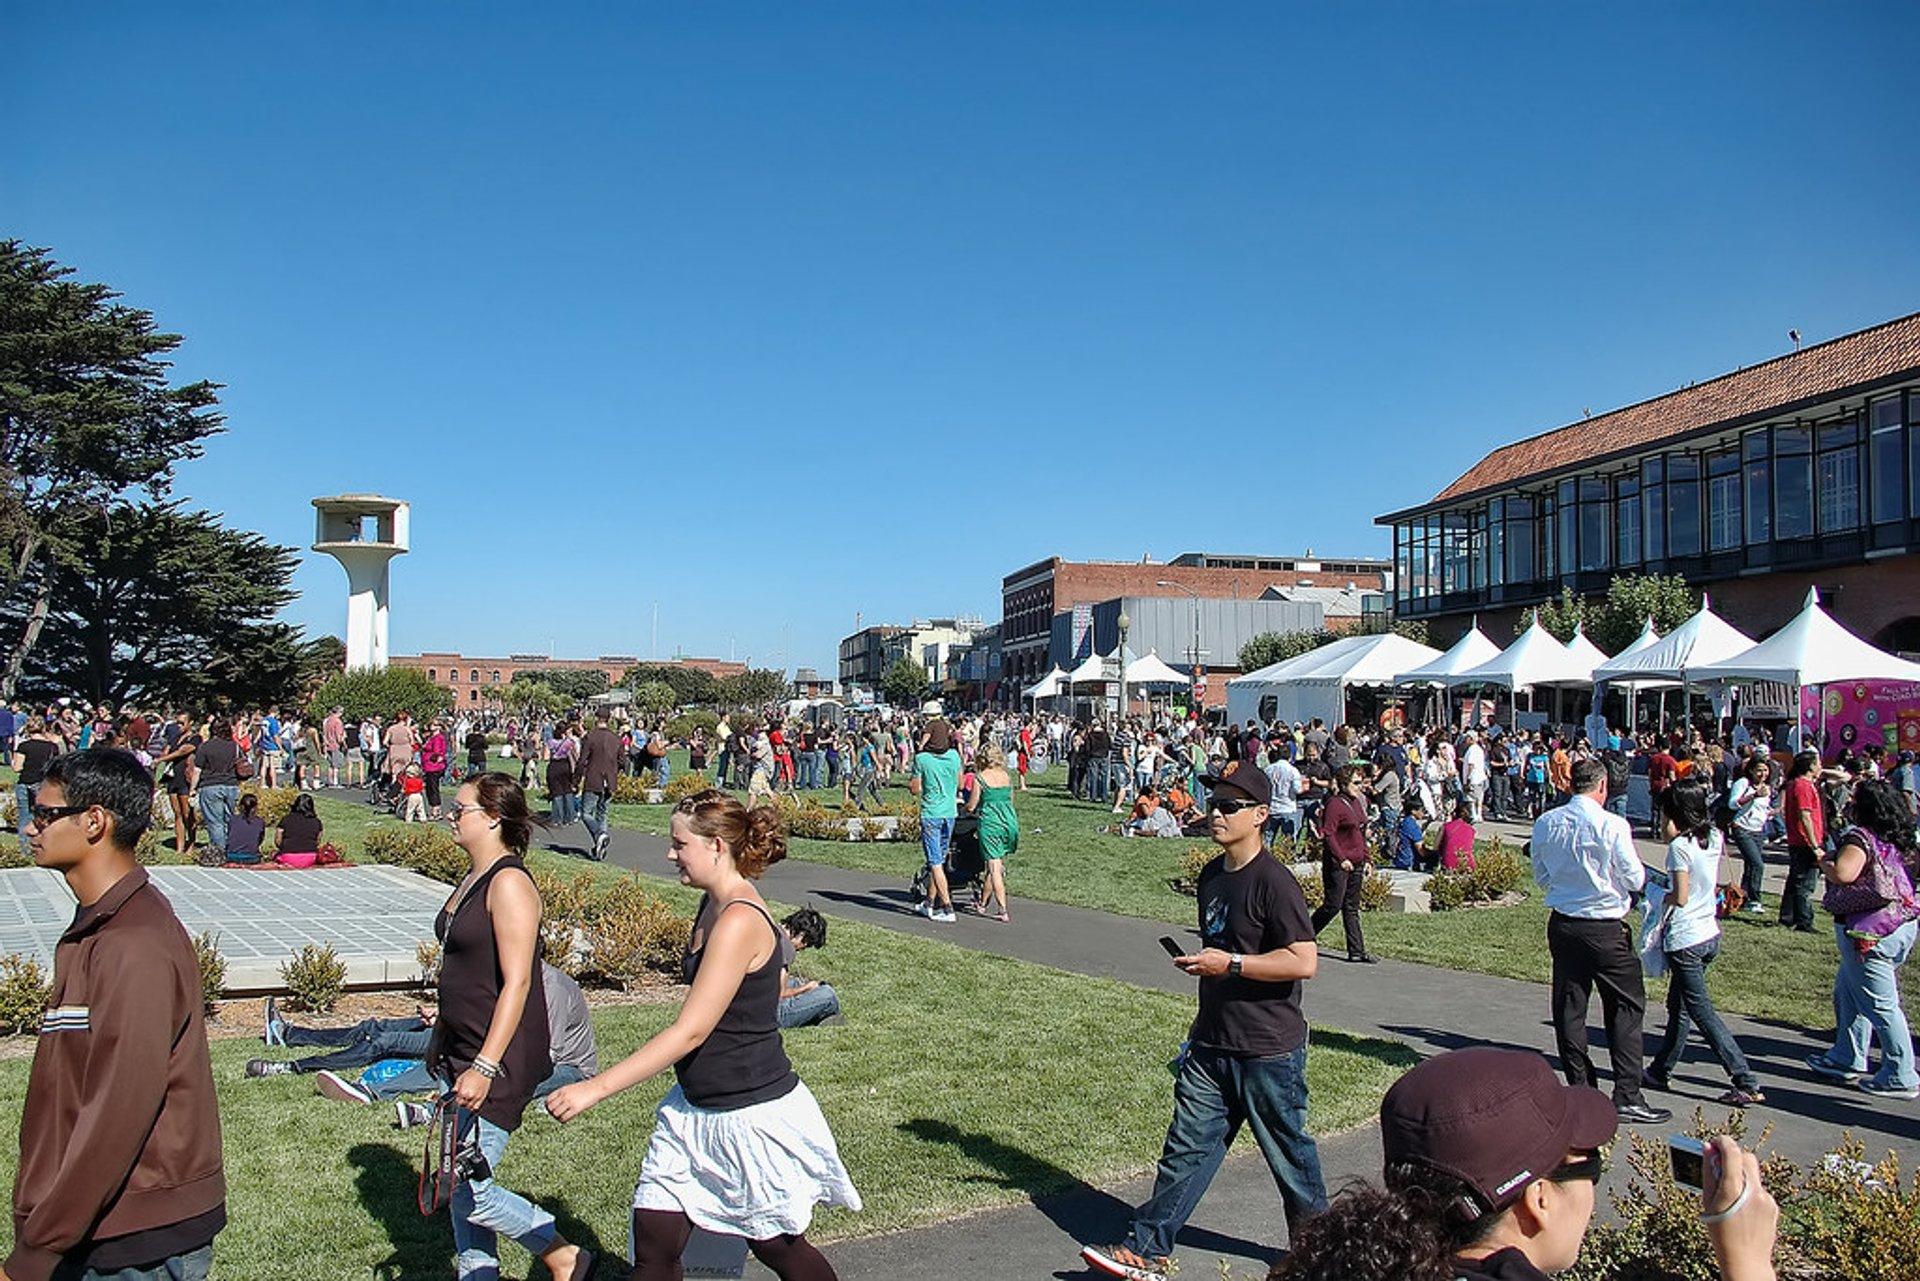 Ghirardelli Chocolate Festival in San Francisco - Best Season 2020